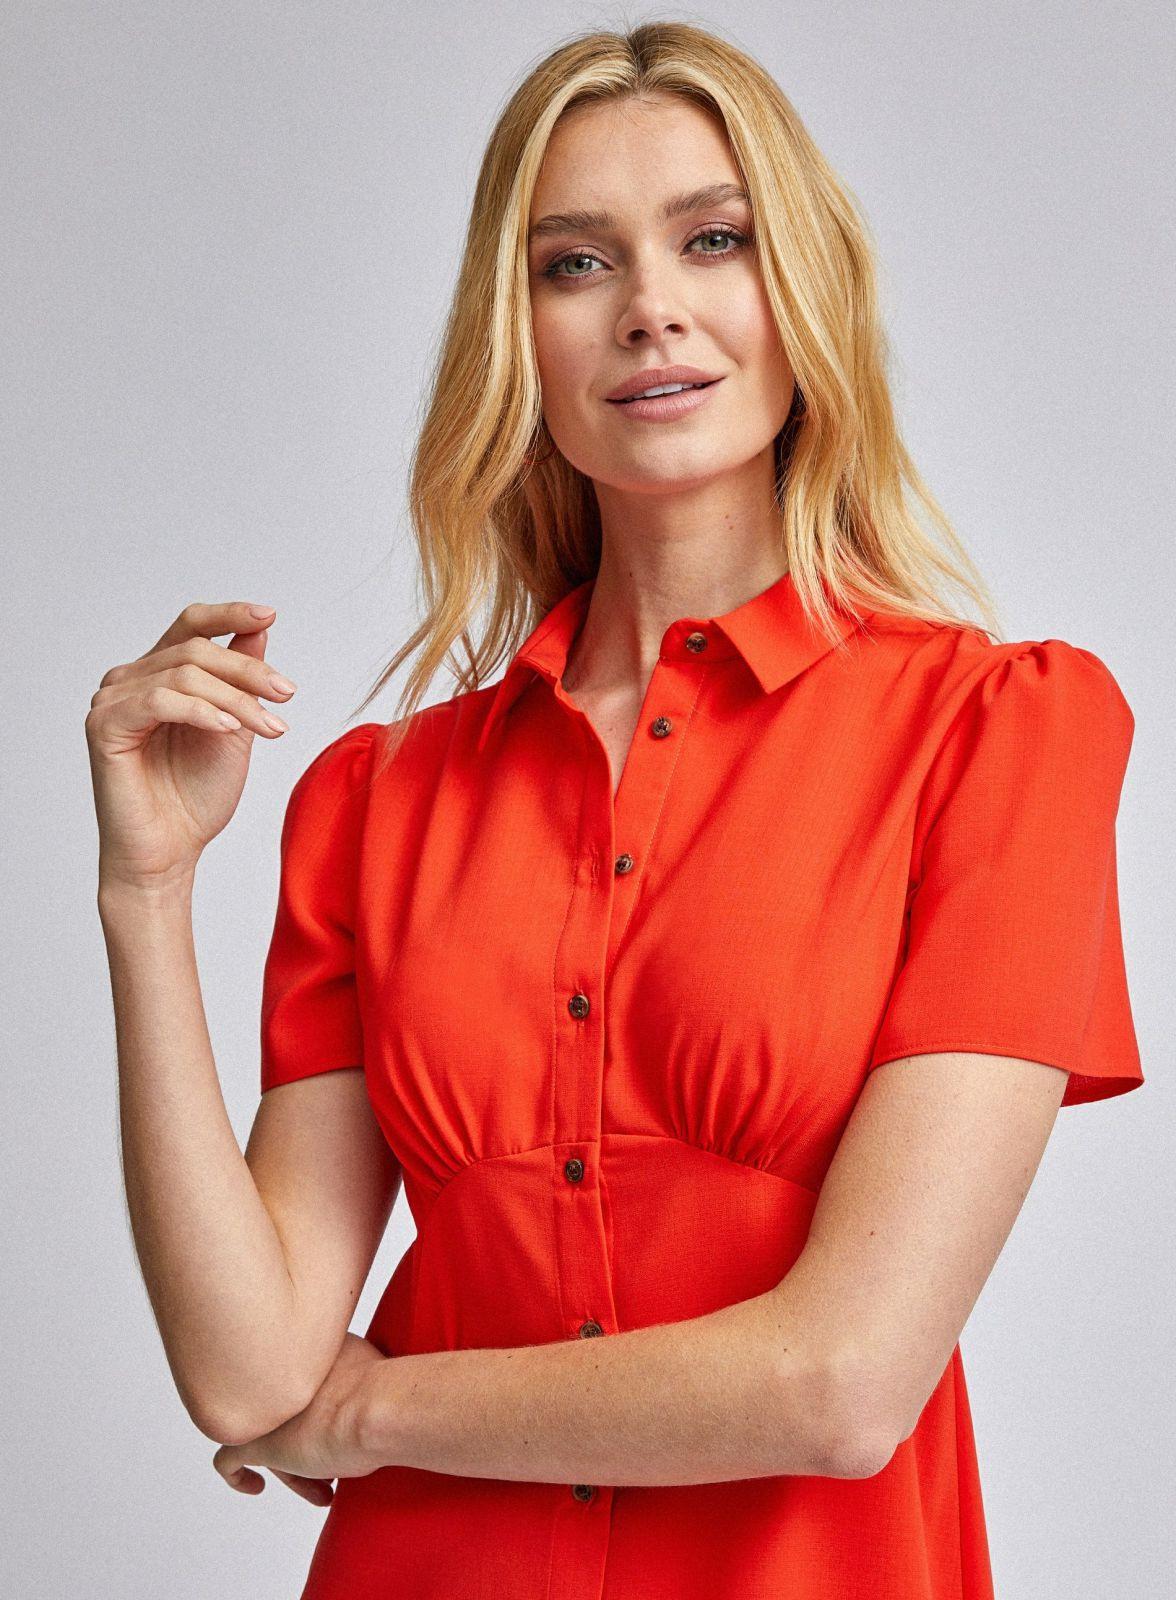 Damen Orangefarbenes Hemdkleid Mit Empirenähten Orange